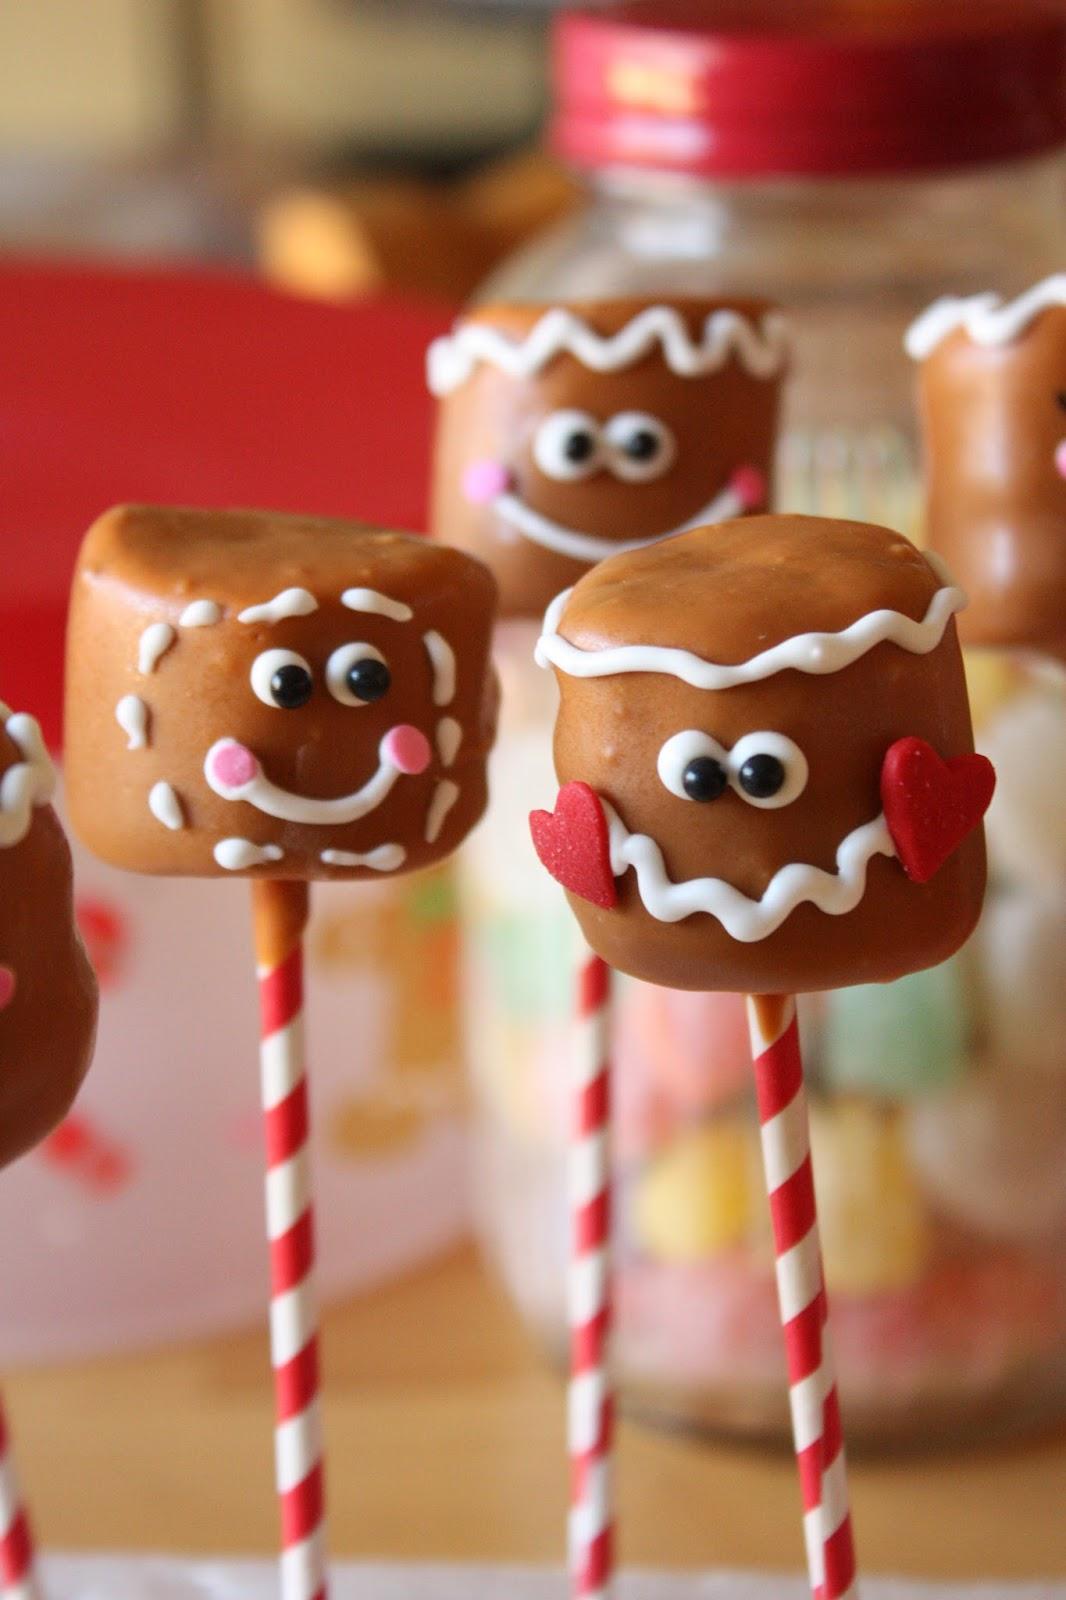 Munchkin Munchies Marshmallow Gingerbread Men Pops